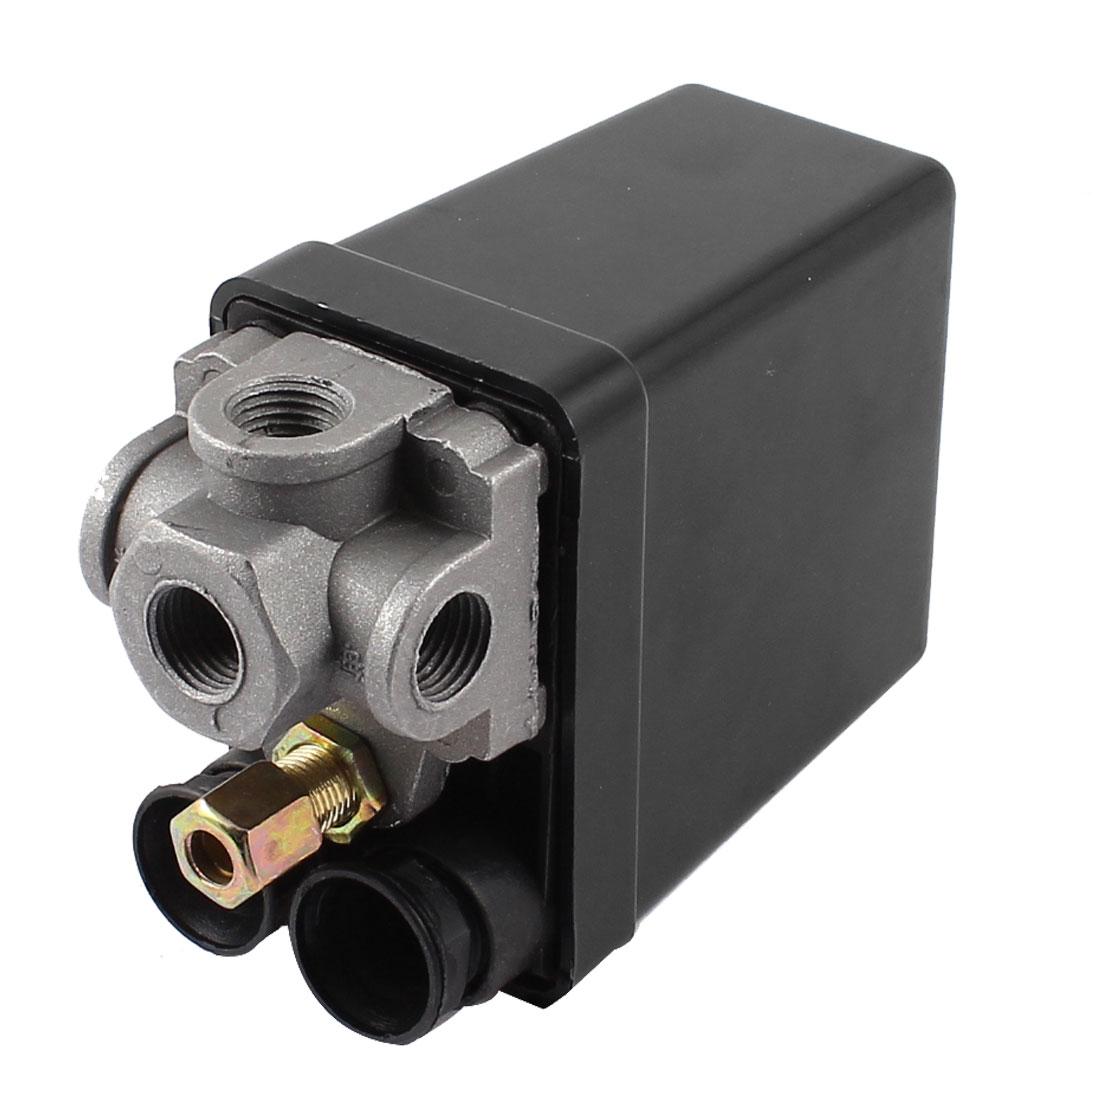 Air Compressor Pressure Switch Control Valve 175PSI 4-Port 1/4PT AC 240V 20A